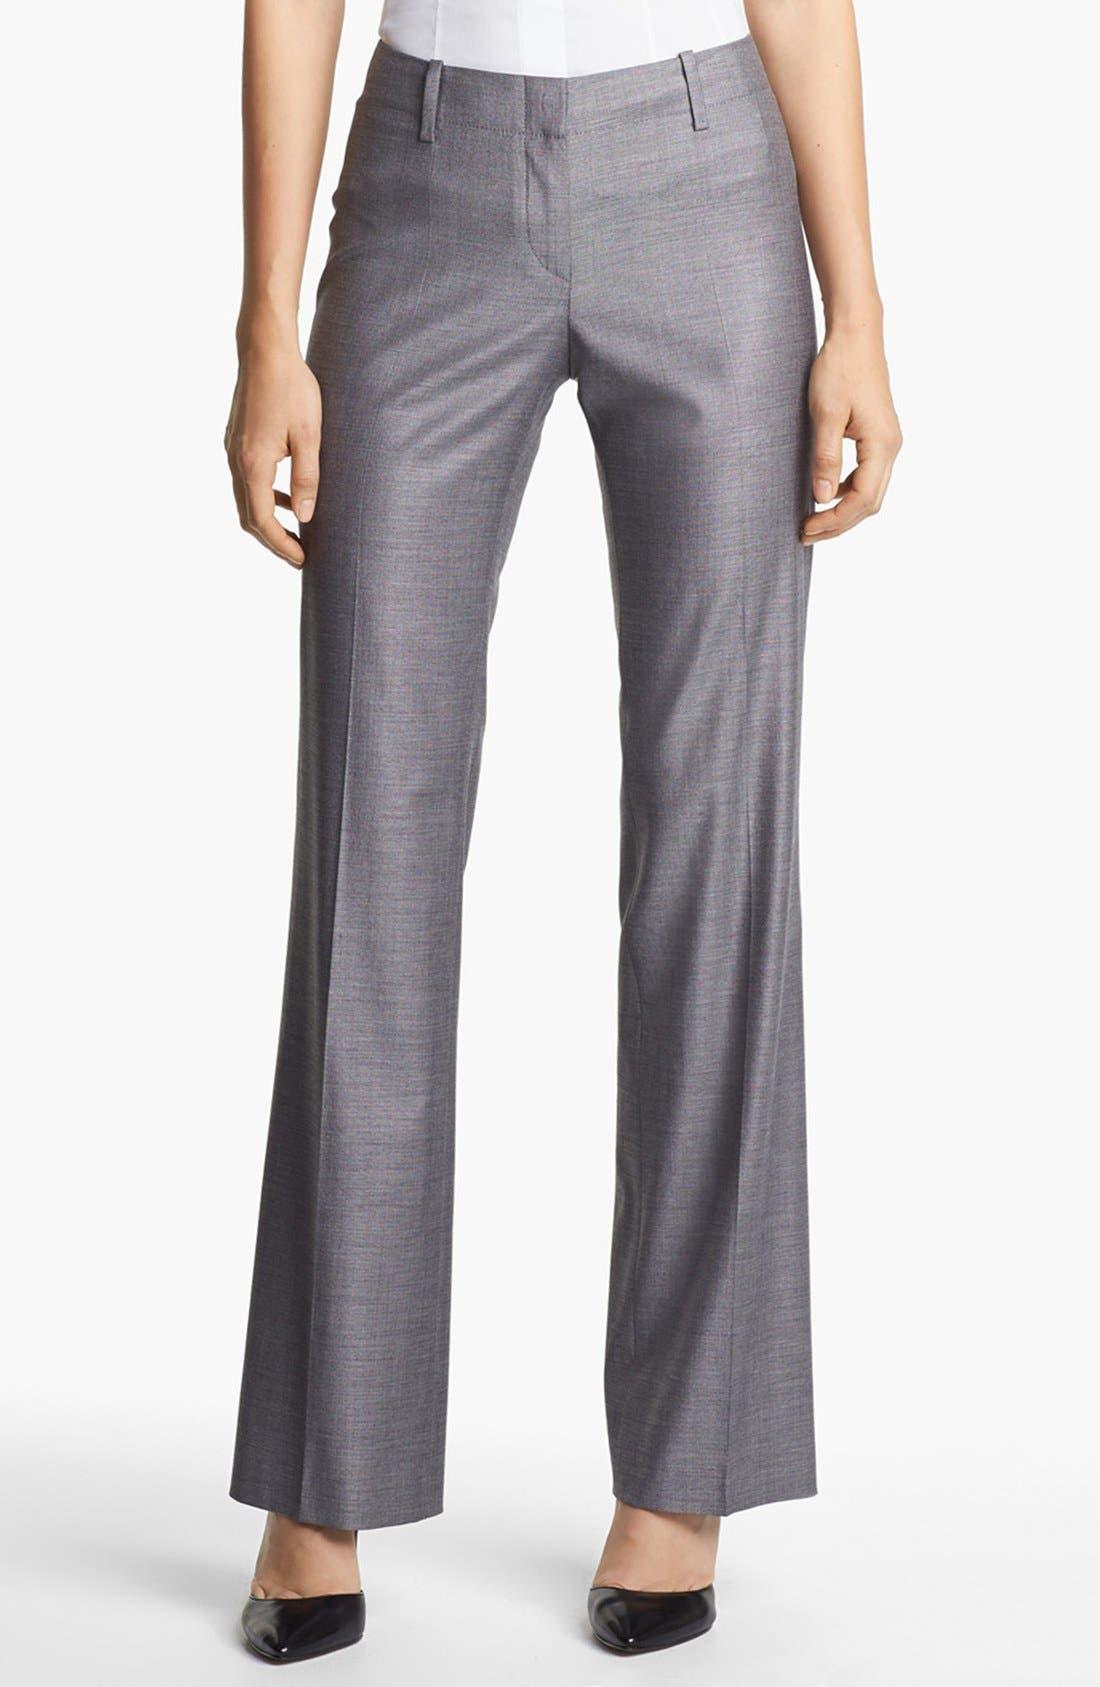 Alternate Image 1 Selected - BOSS HUGO BOSS 'Tulia' Trousers